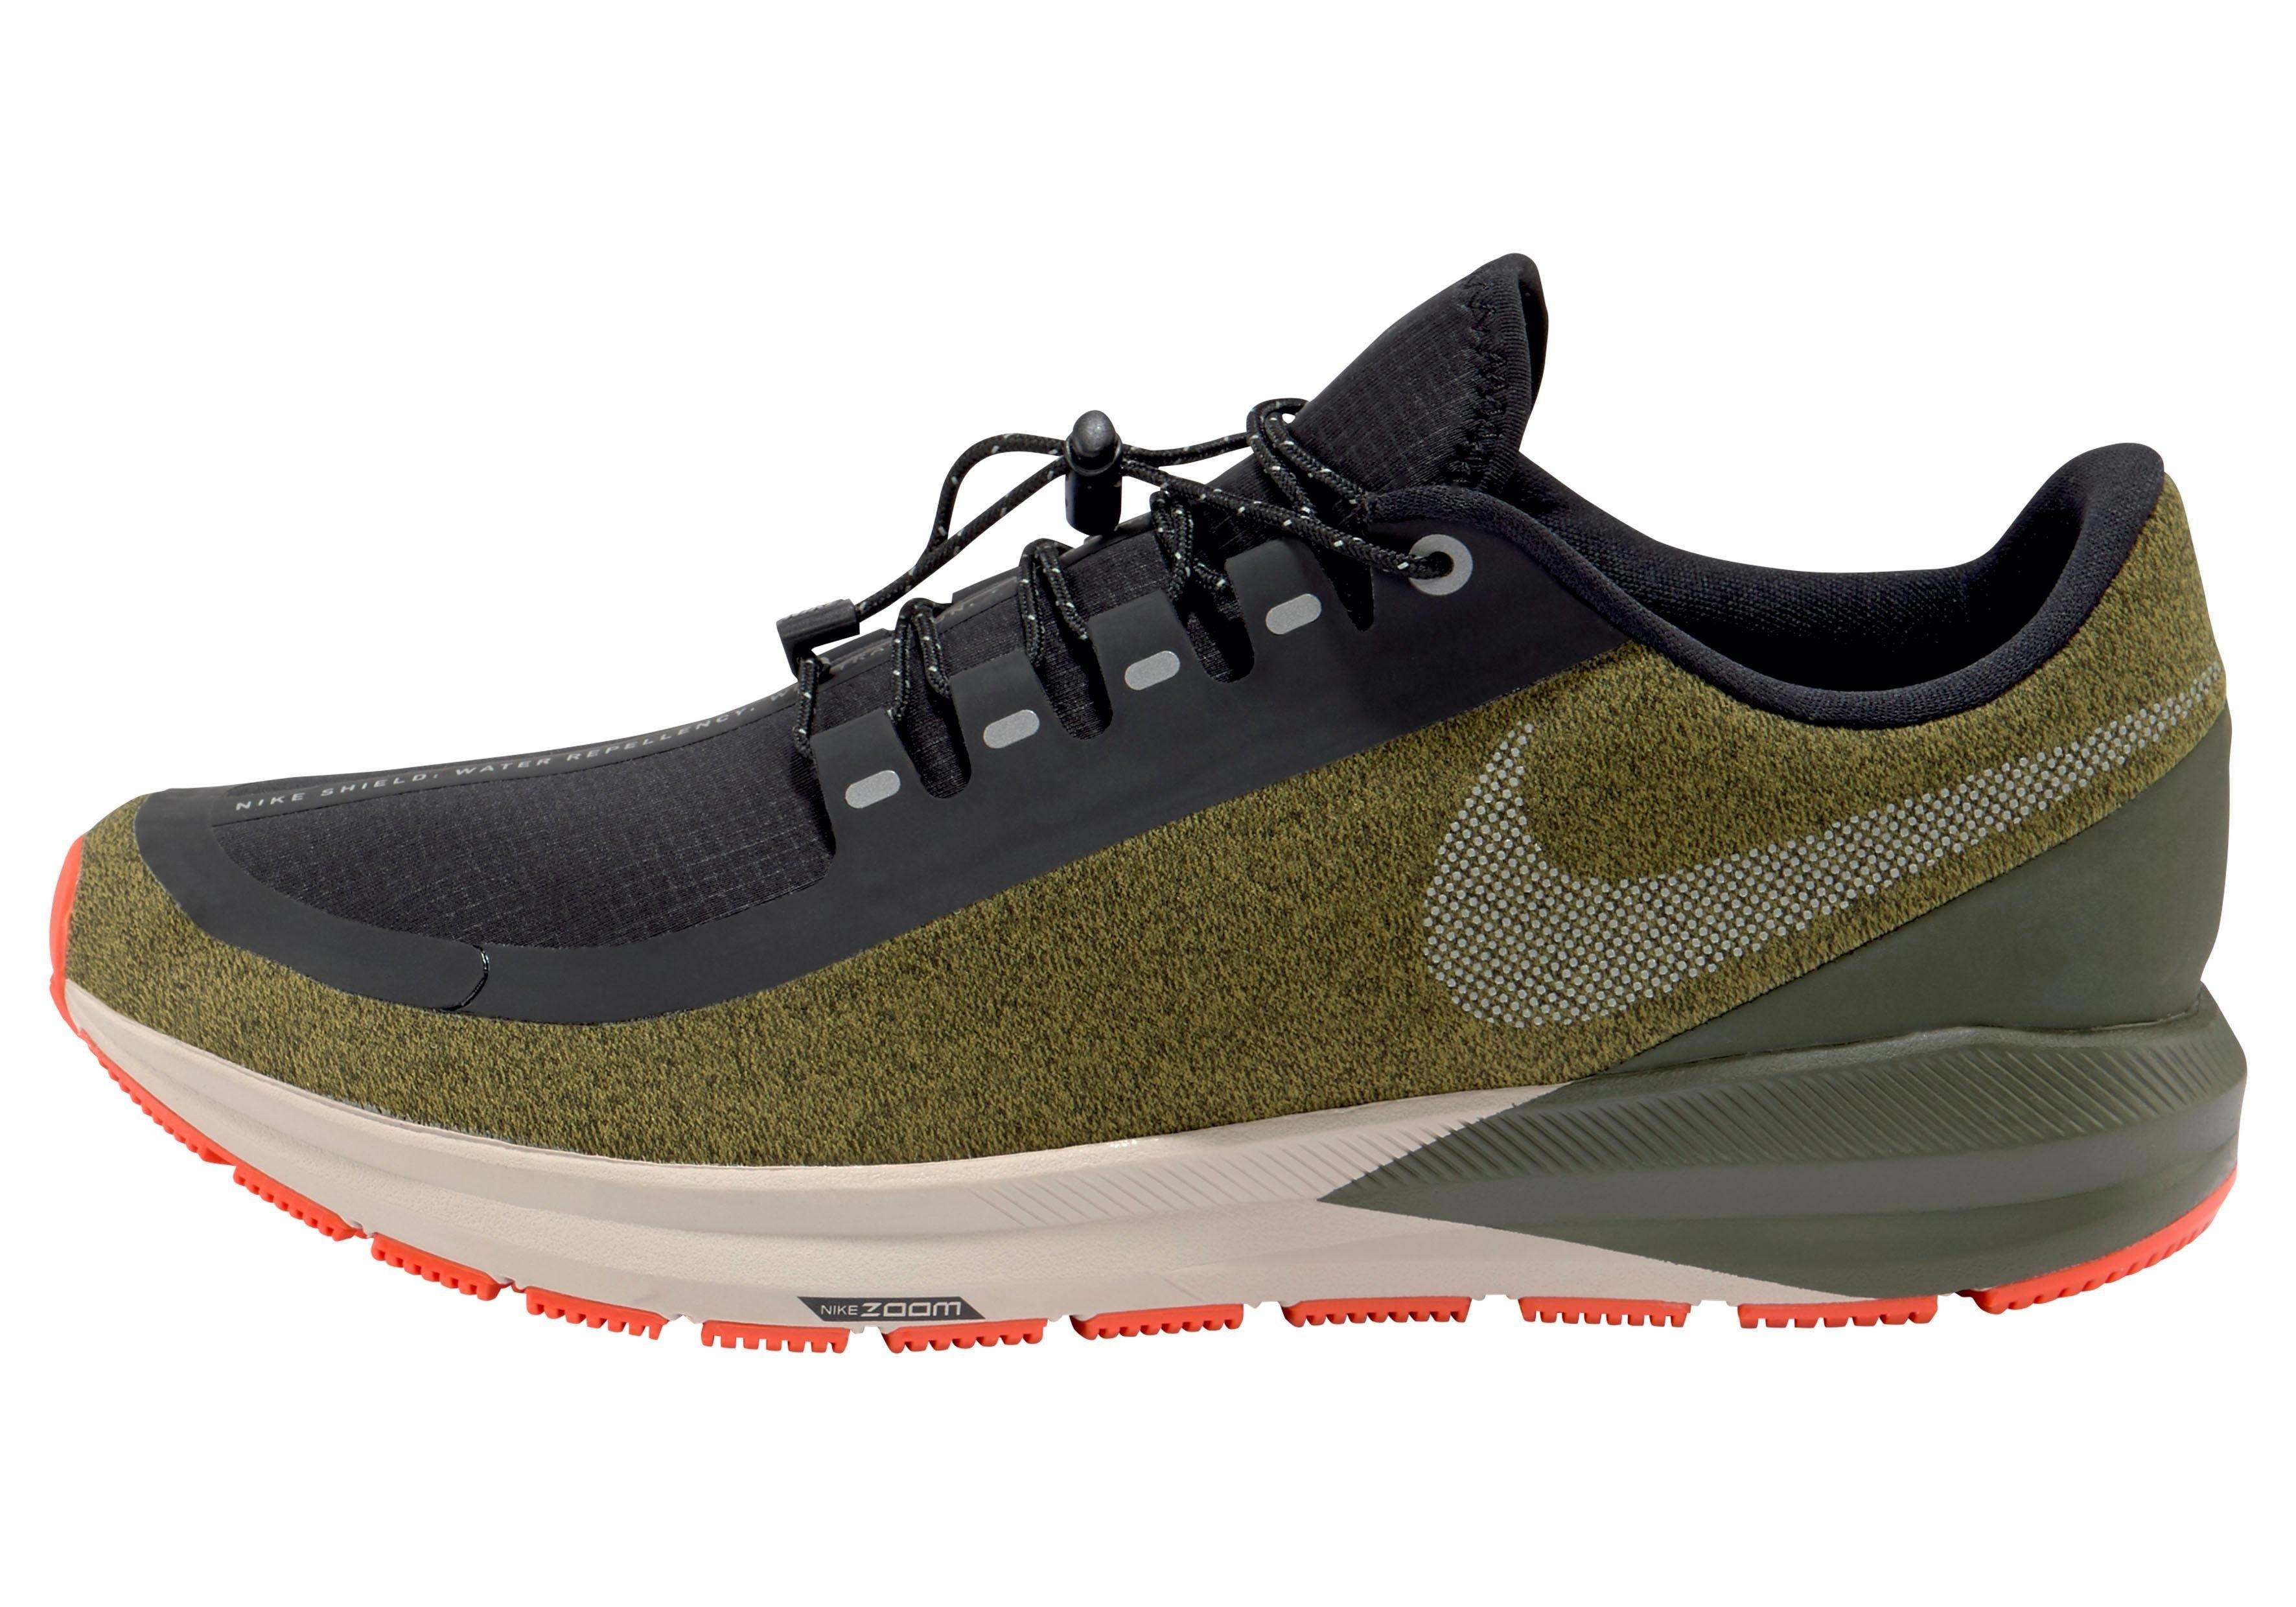 32c0ebf7281 Nike runningschoenen »Air Zoom Structure 22 Shield« makkelijk ...